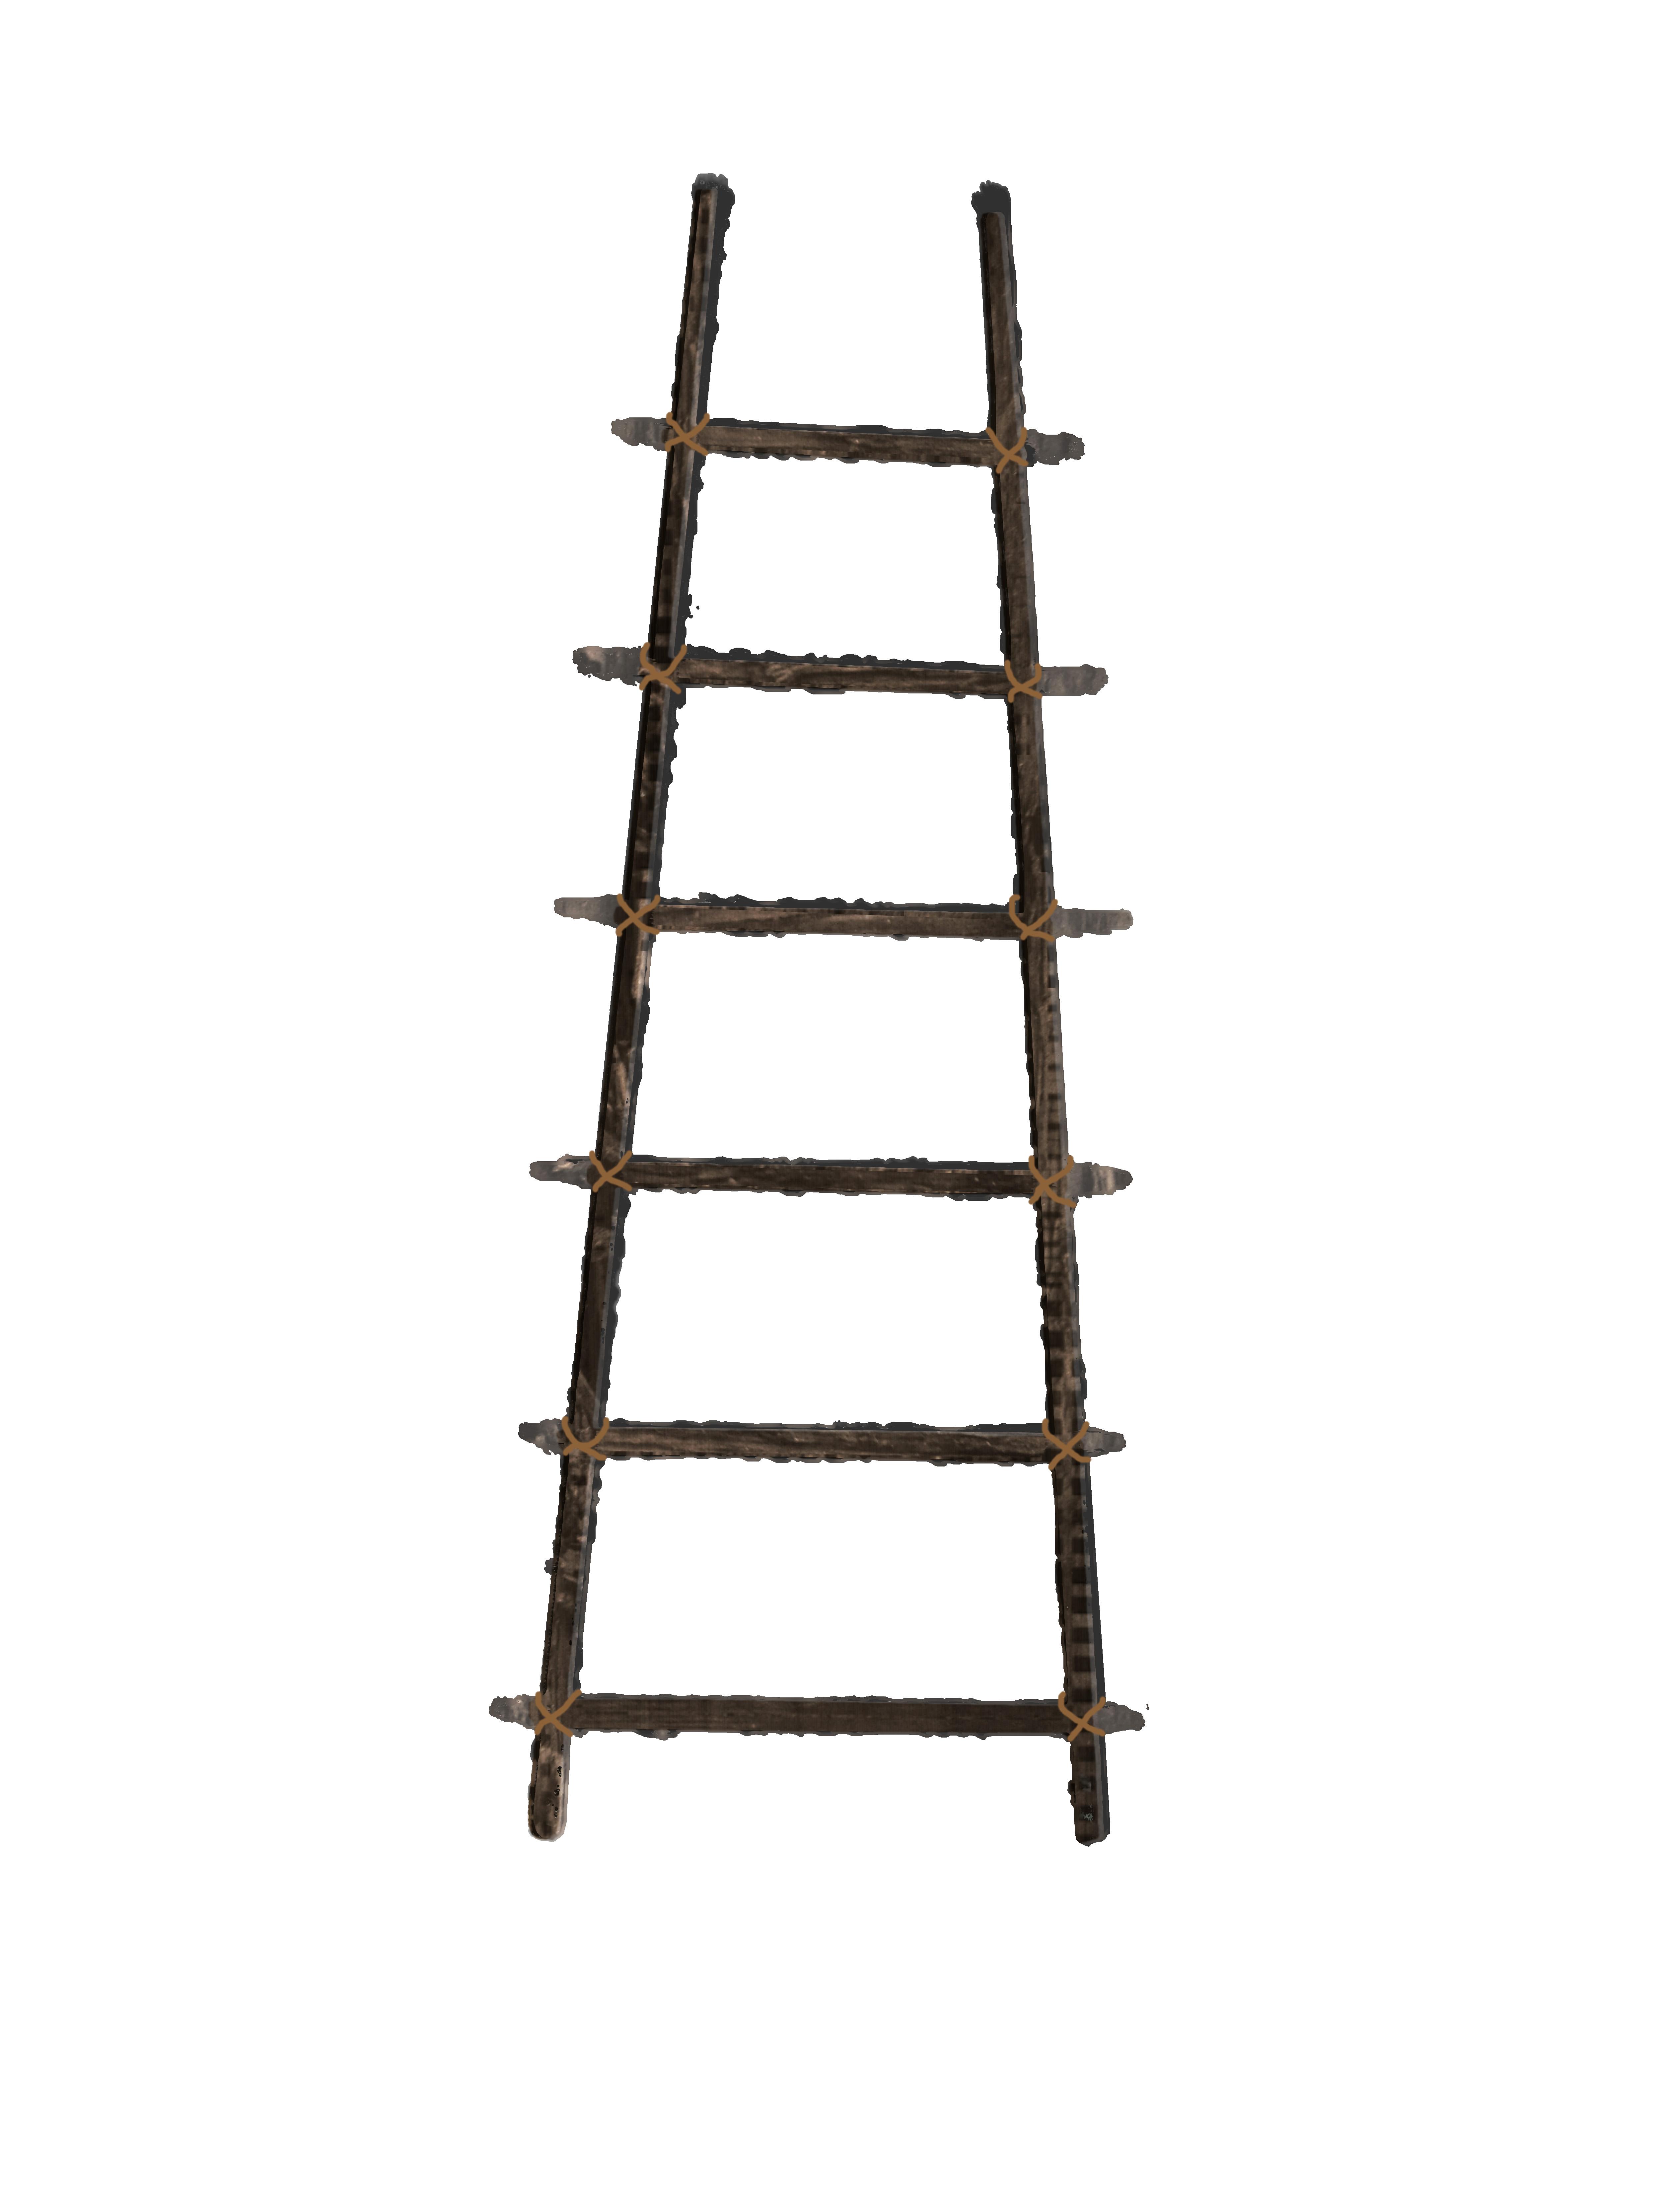 Ladder Hd Png Transparent Ladder Hd Png Images Pluspng